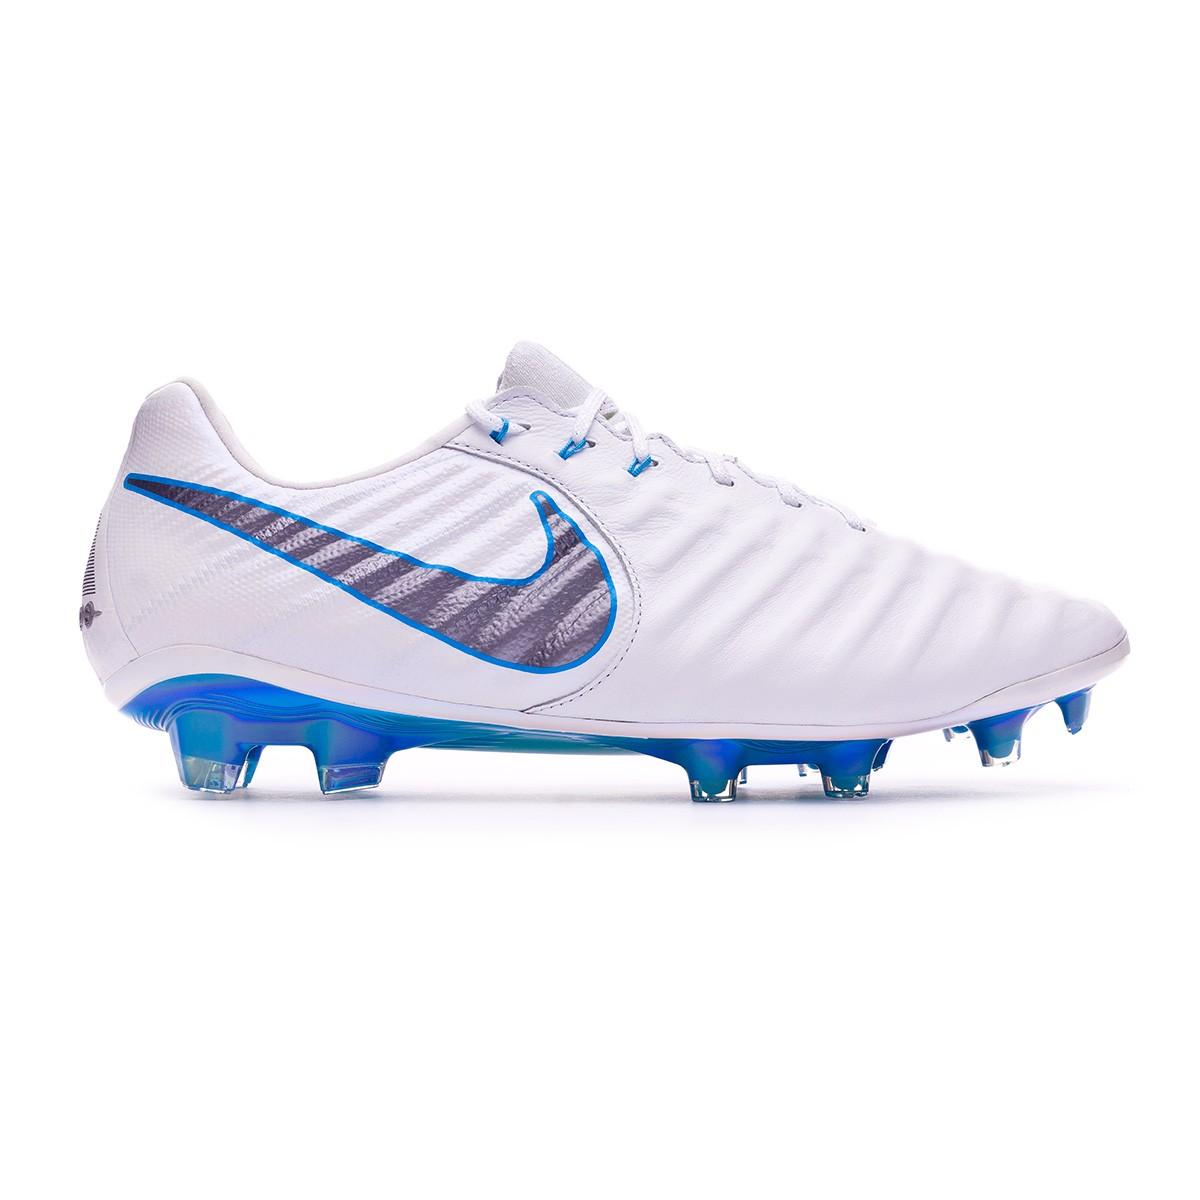 9fc1125c51eb Football Boots Nike Tiempo Legend VII Elite FG White-Metallic cool grey-Blue  hero - Football store Fútbol Emotion